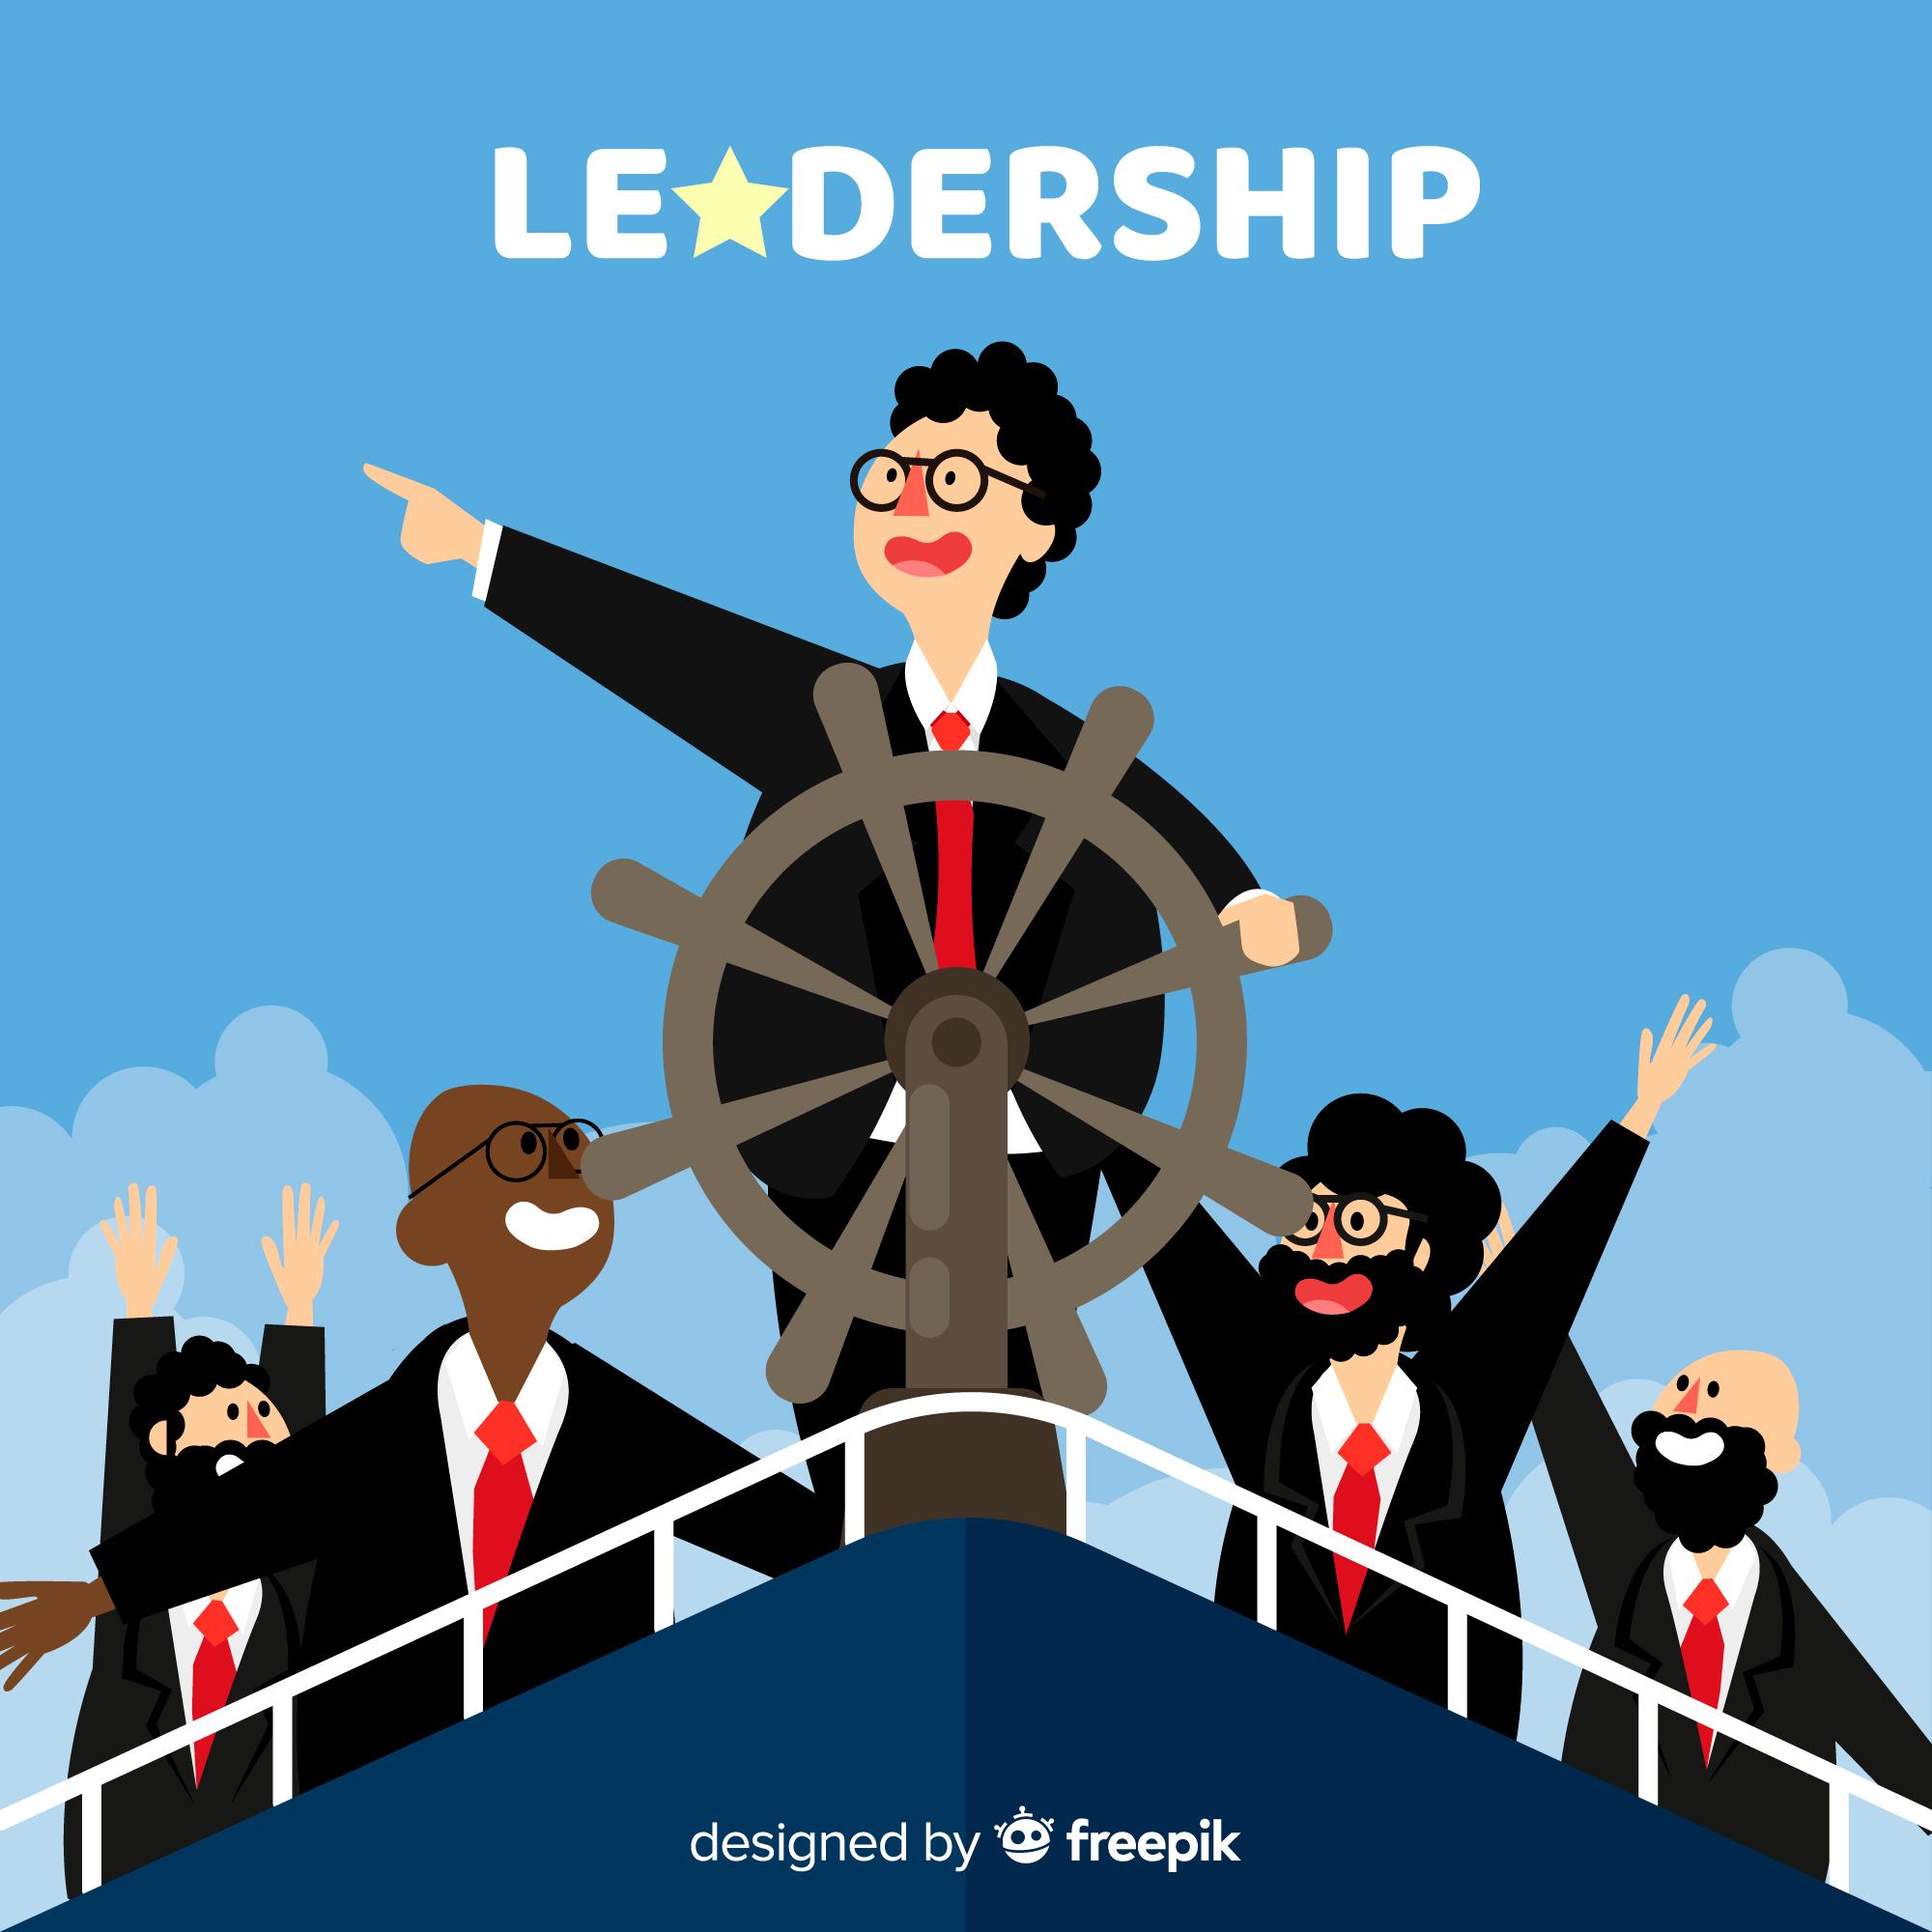 Top 5 Leadership Mistakes to Avoid